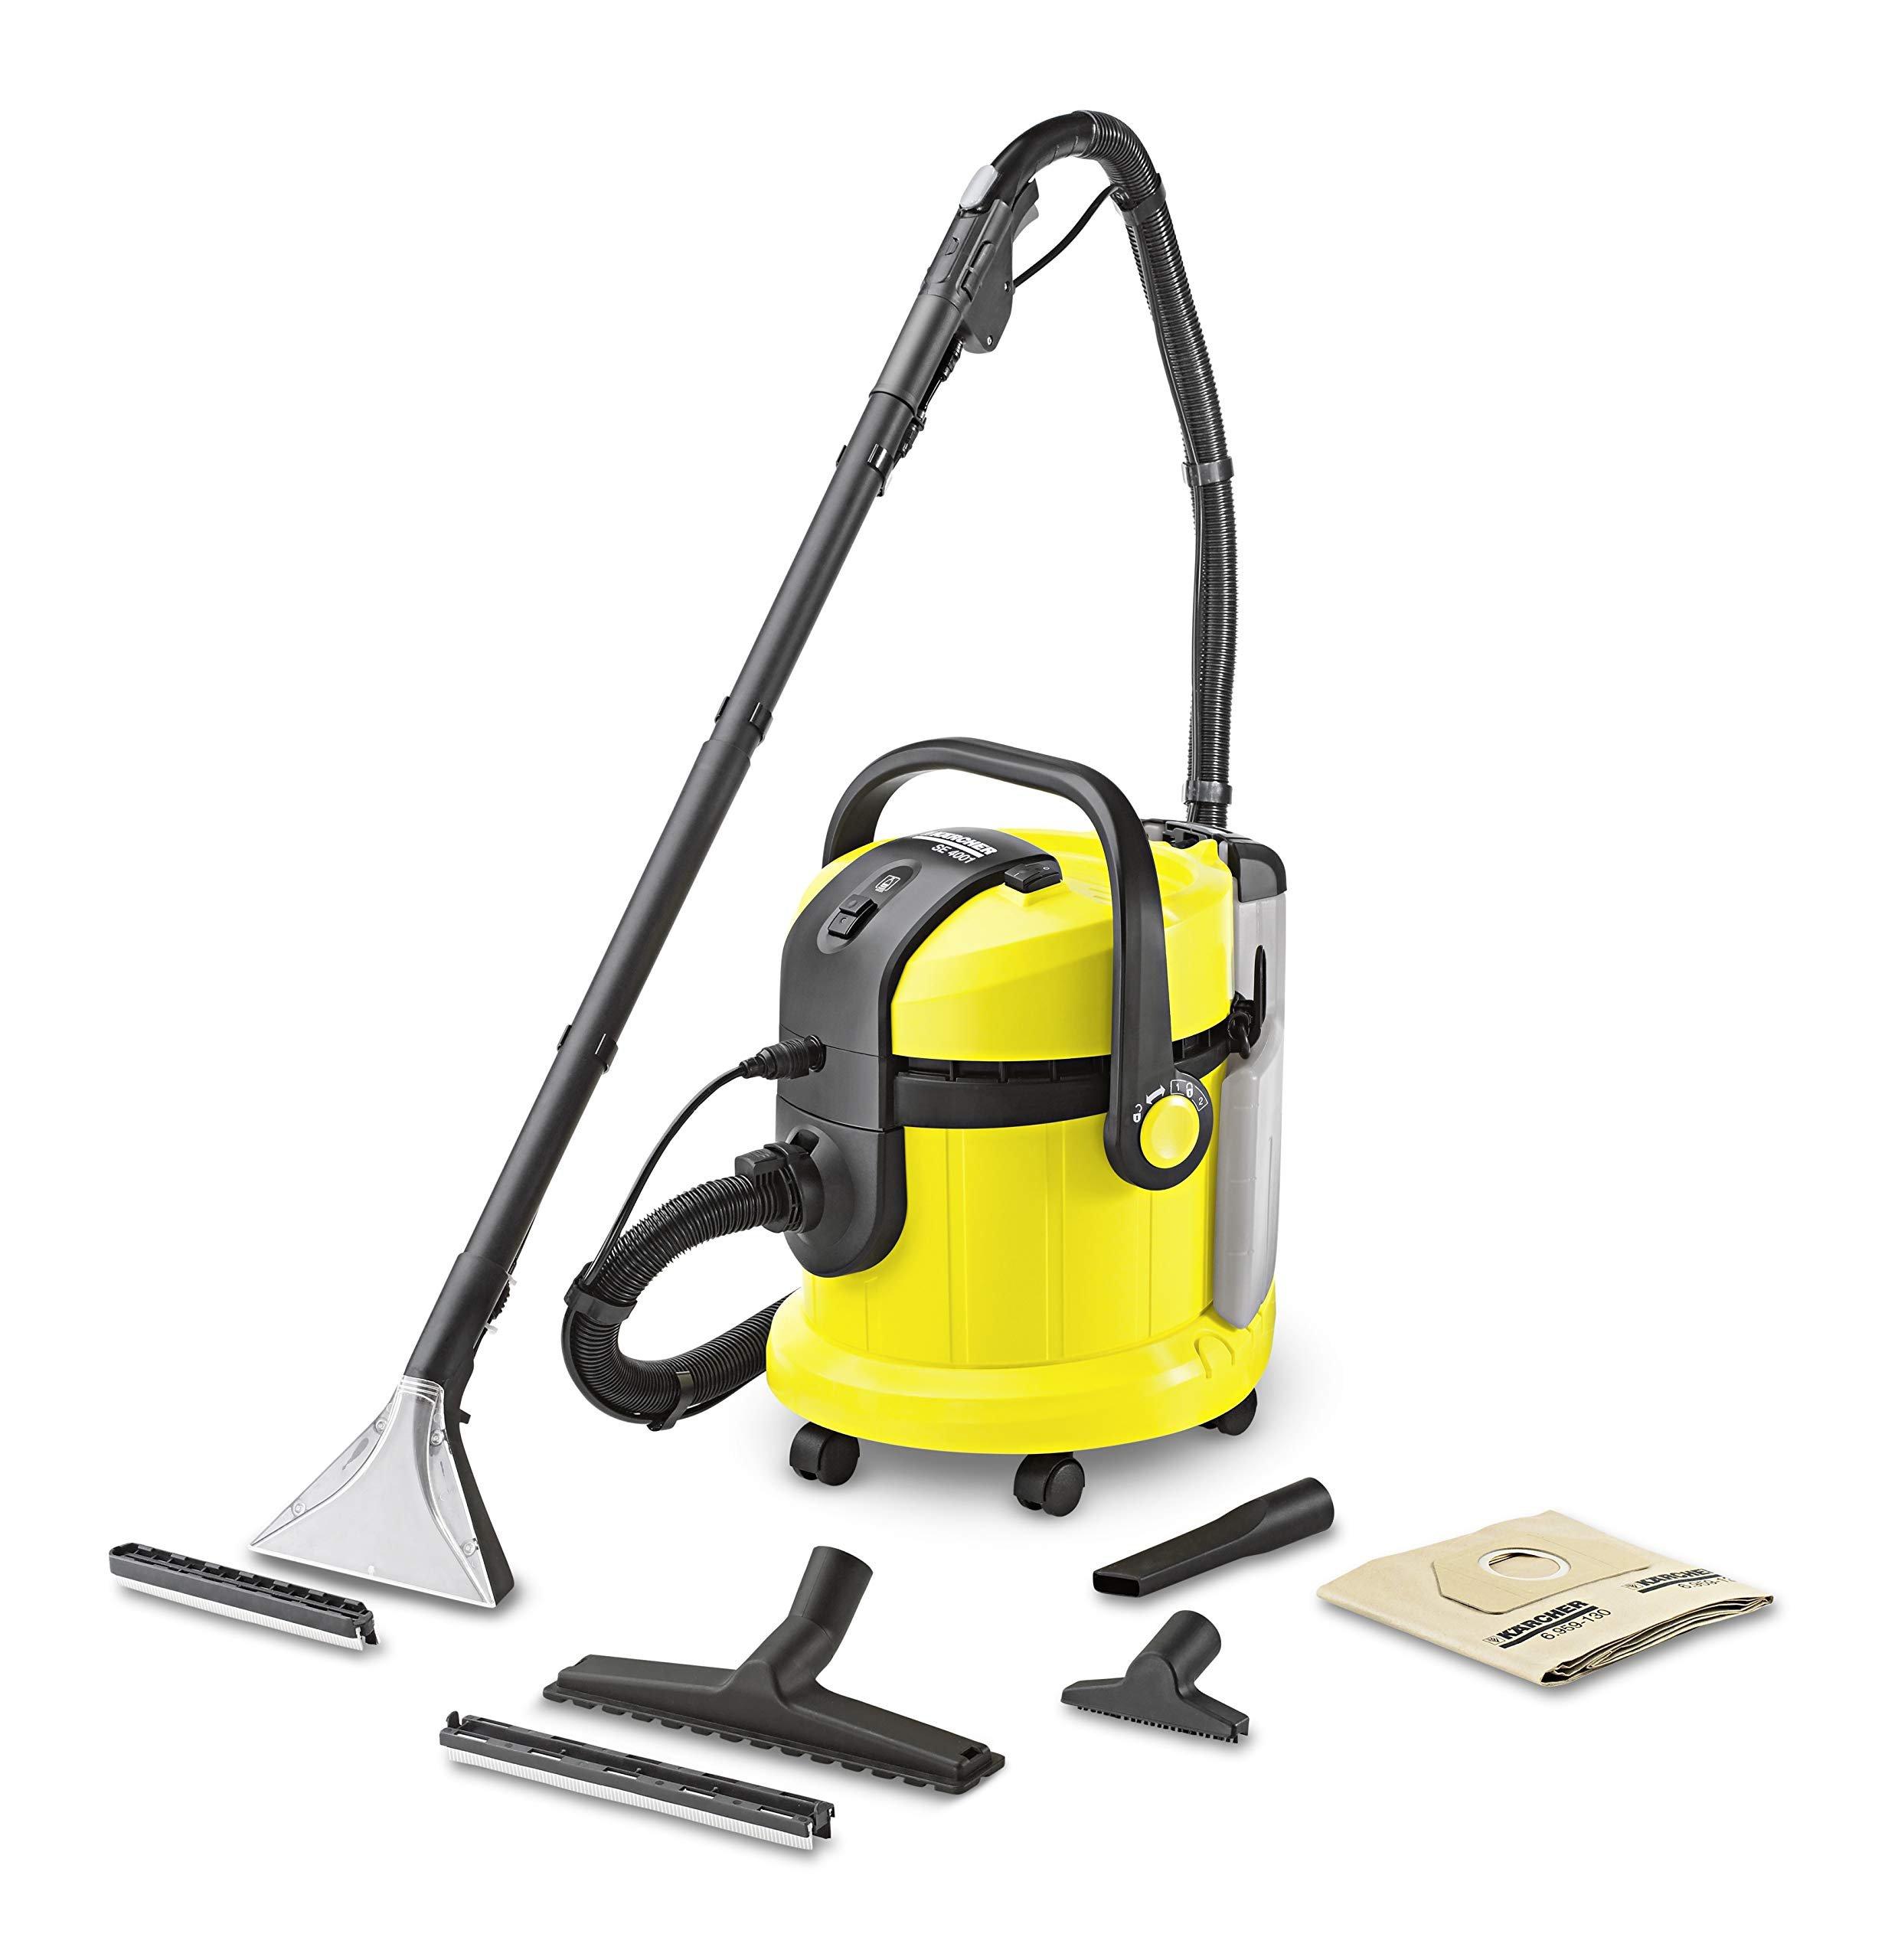 Kärcher - Hardfloor and Carpet Cleaner - SE 4.001 (Demo)